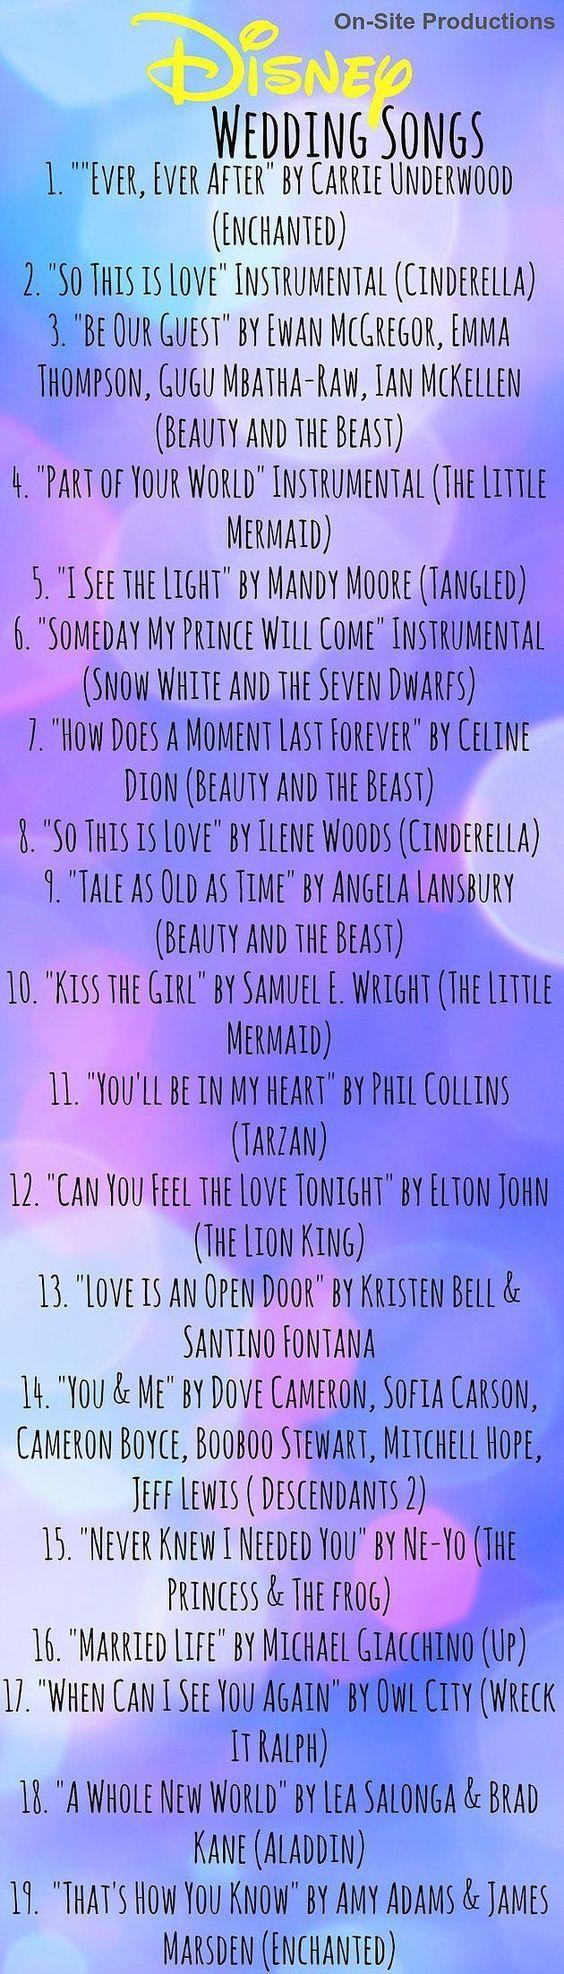 Walk Down Aisle To A Tale As Old As Time Instrumental In 2020 Disney Wedding Songs Wedding Songs Disney Wedding